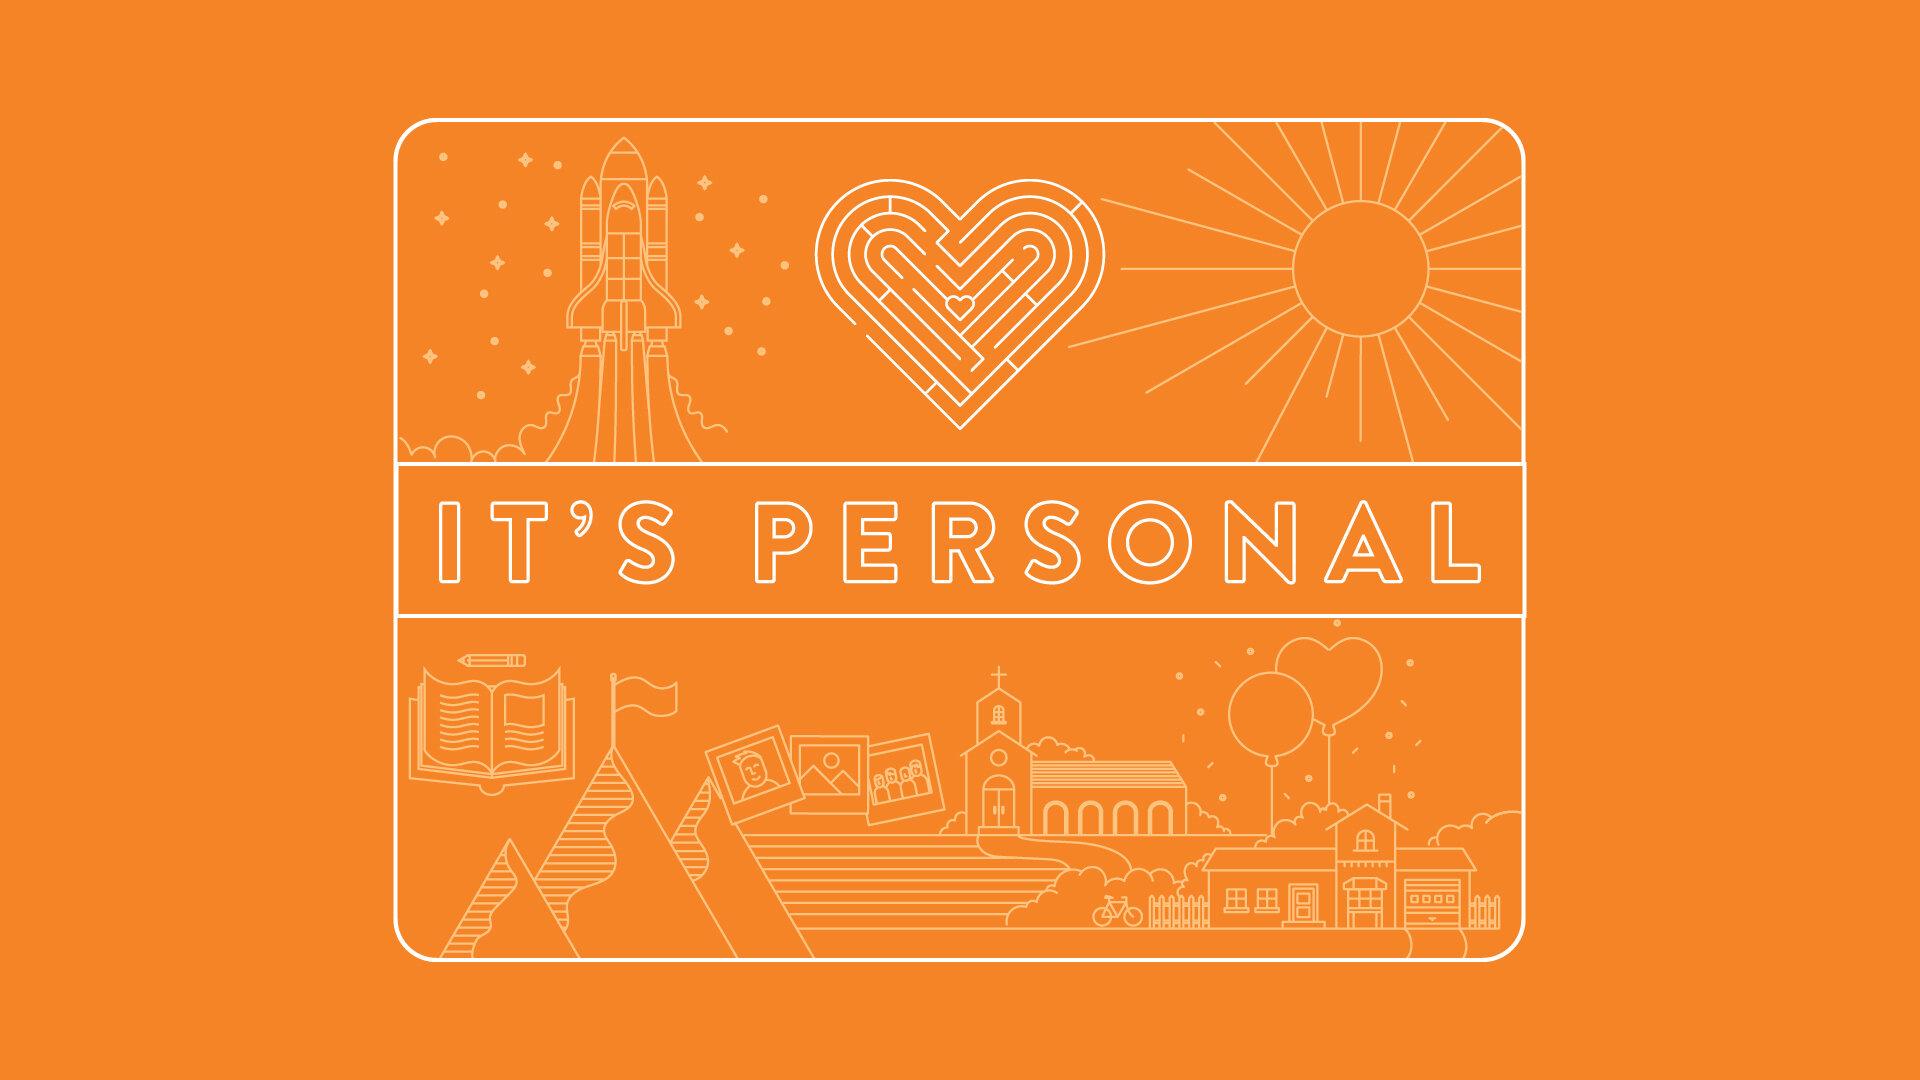 Its-Personal-6-9-19.jpg